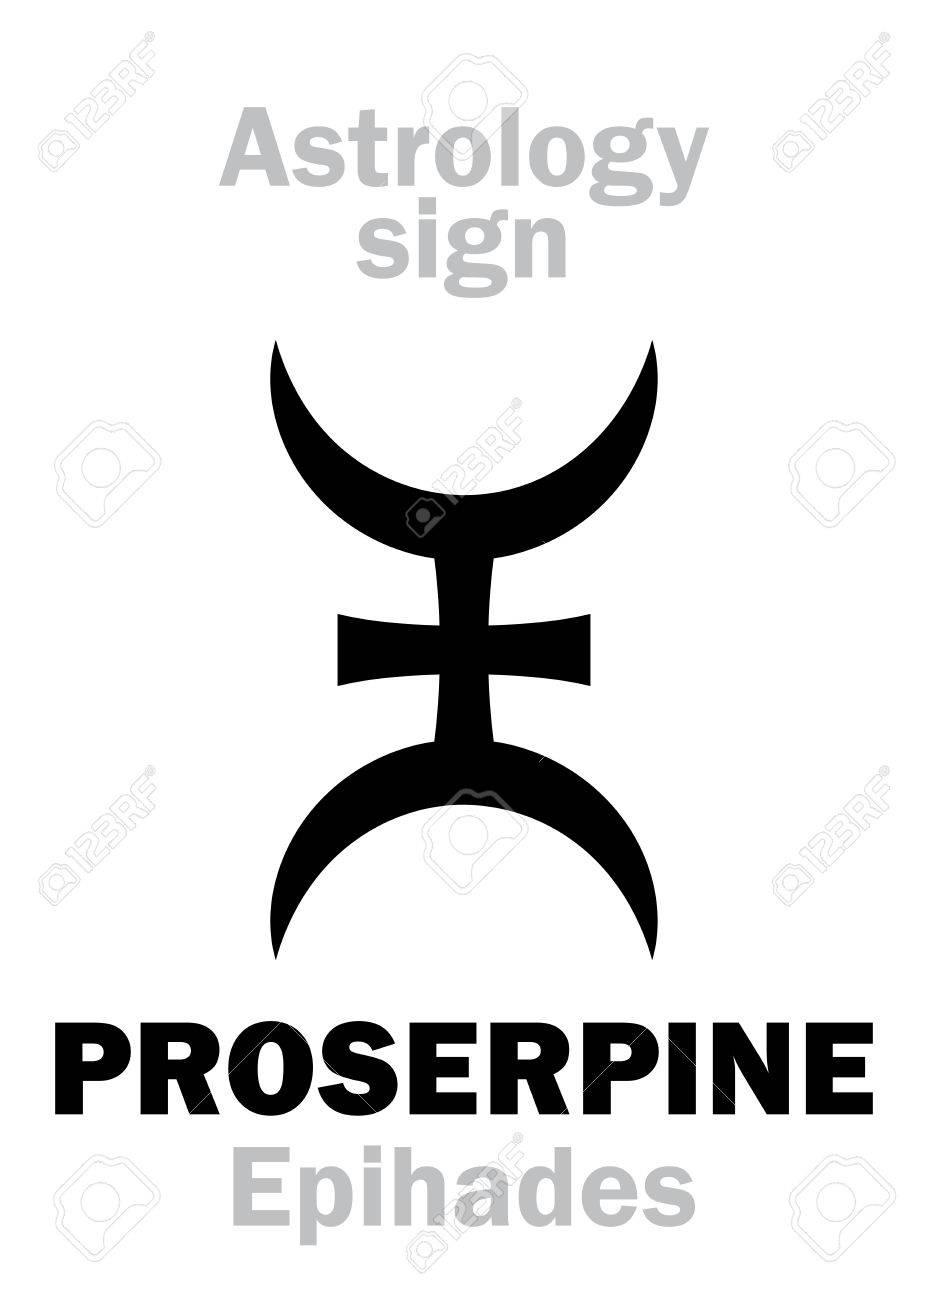 Astrology Alphabet Proserpine Epihades Supreme Hypothetic